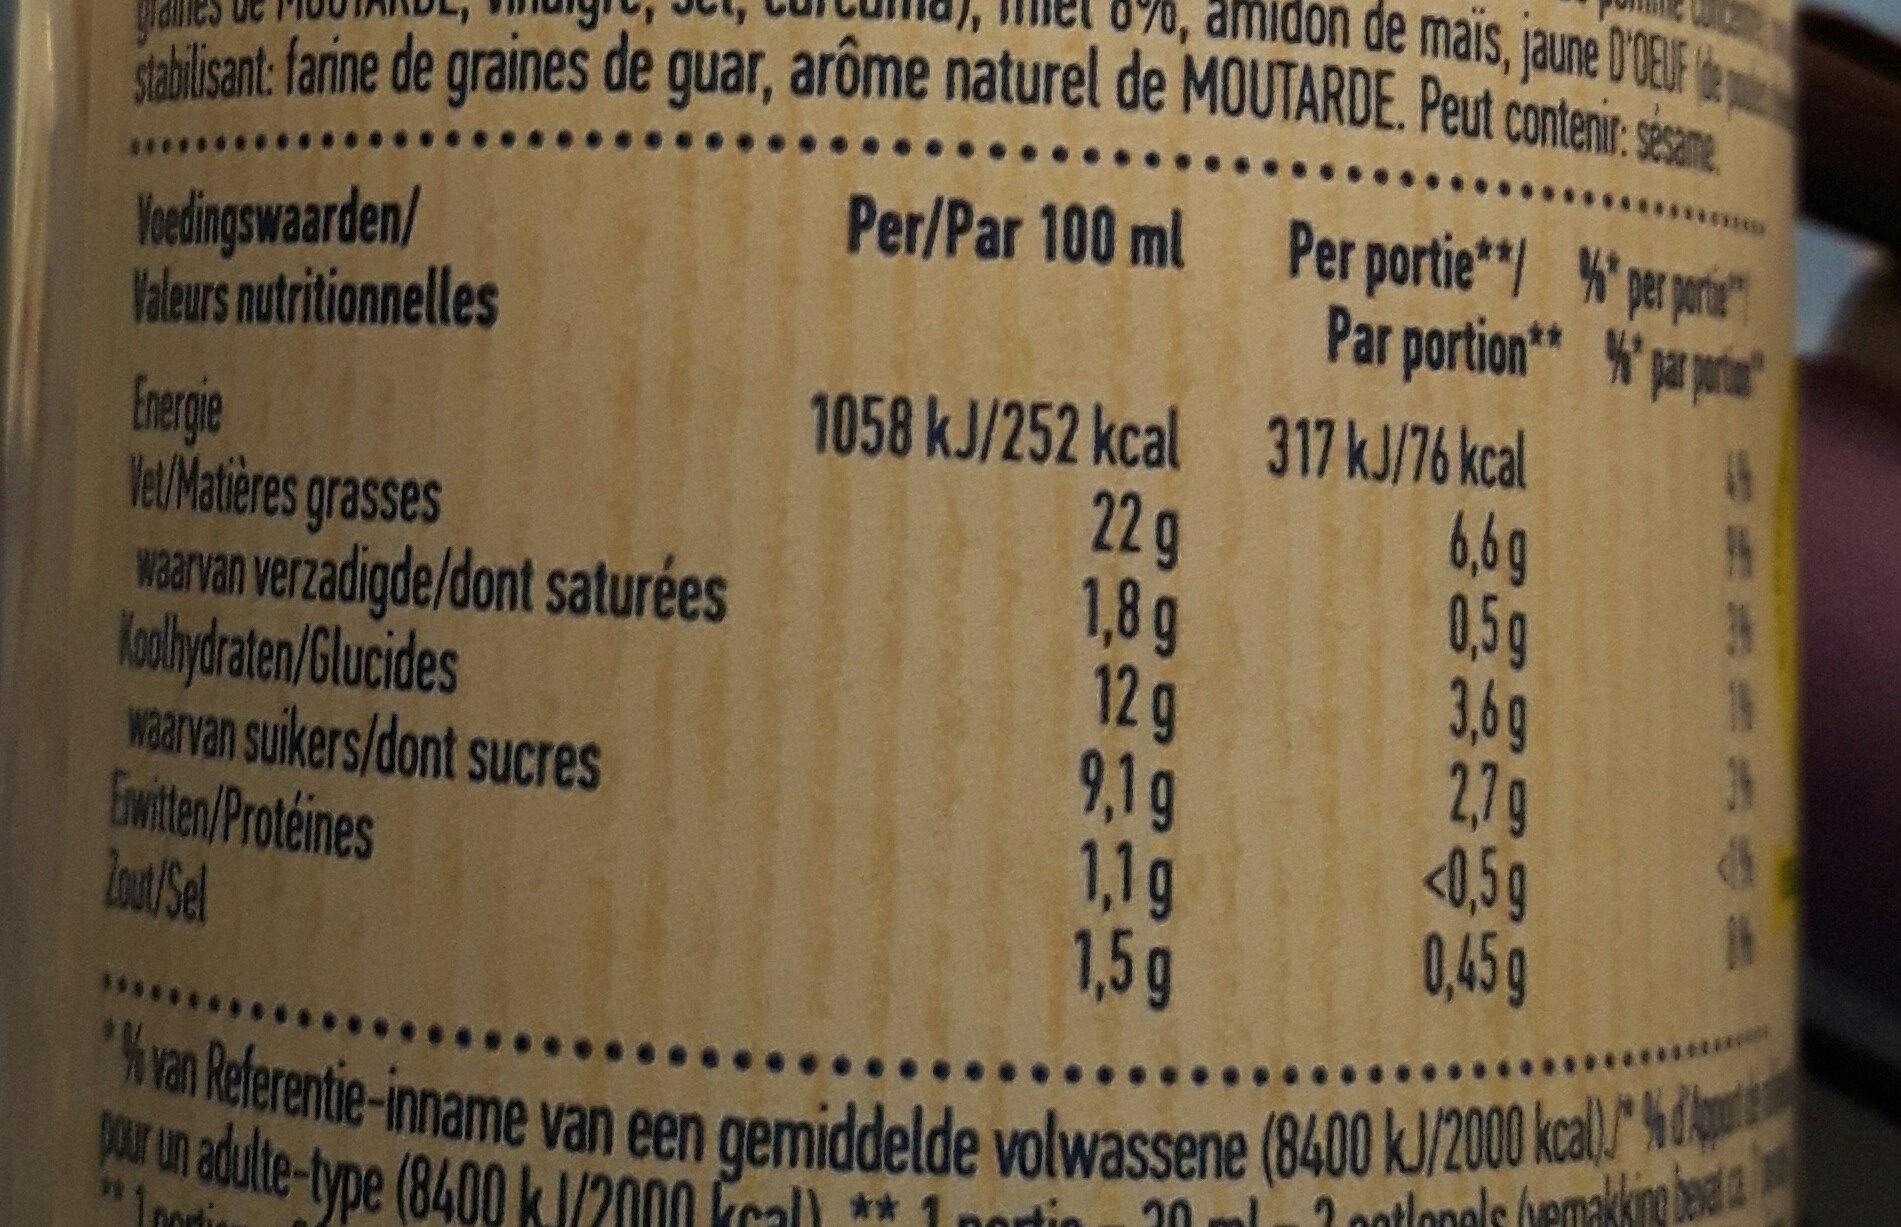 Honey and Mustard - Salad dressing - Voedingswaarden - fr